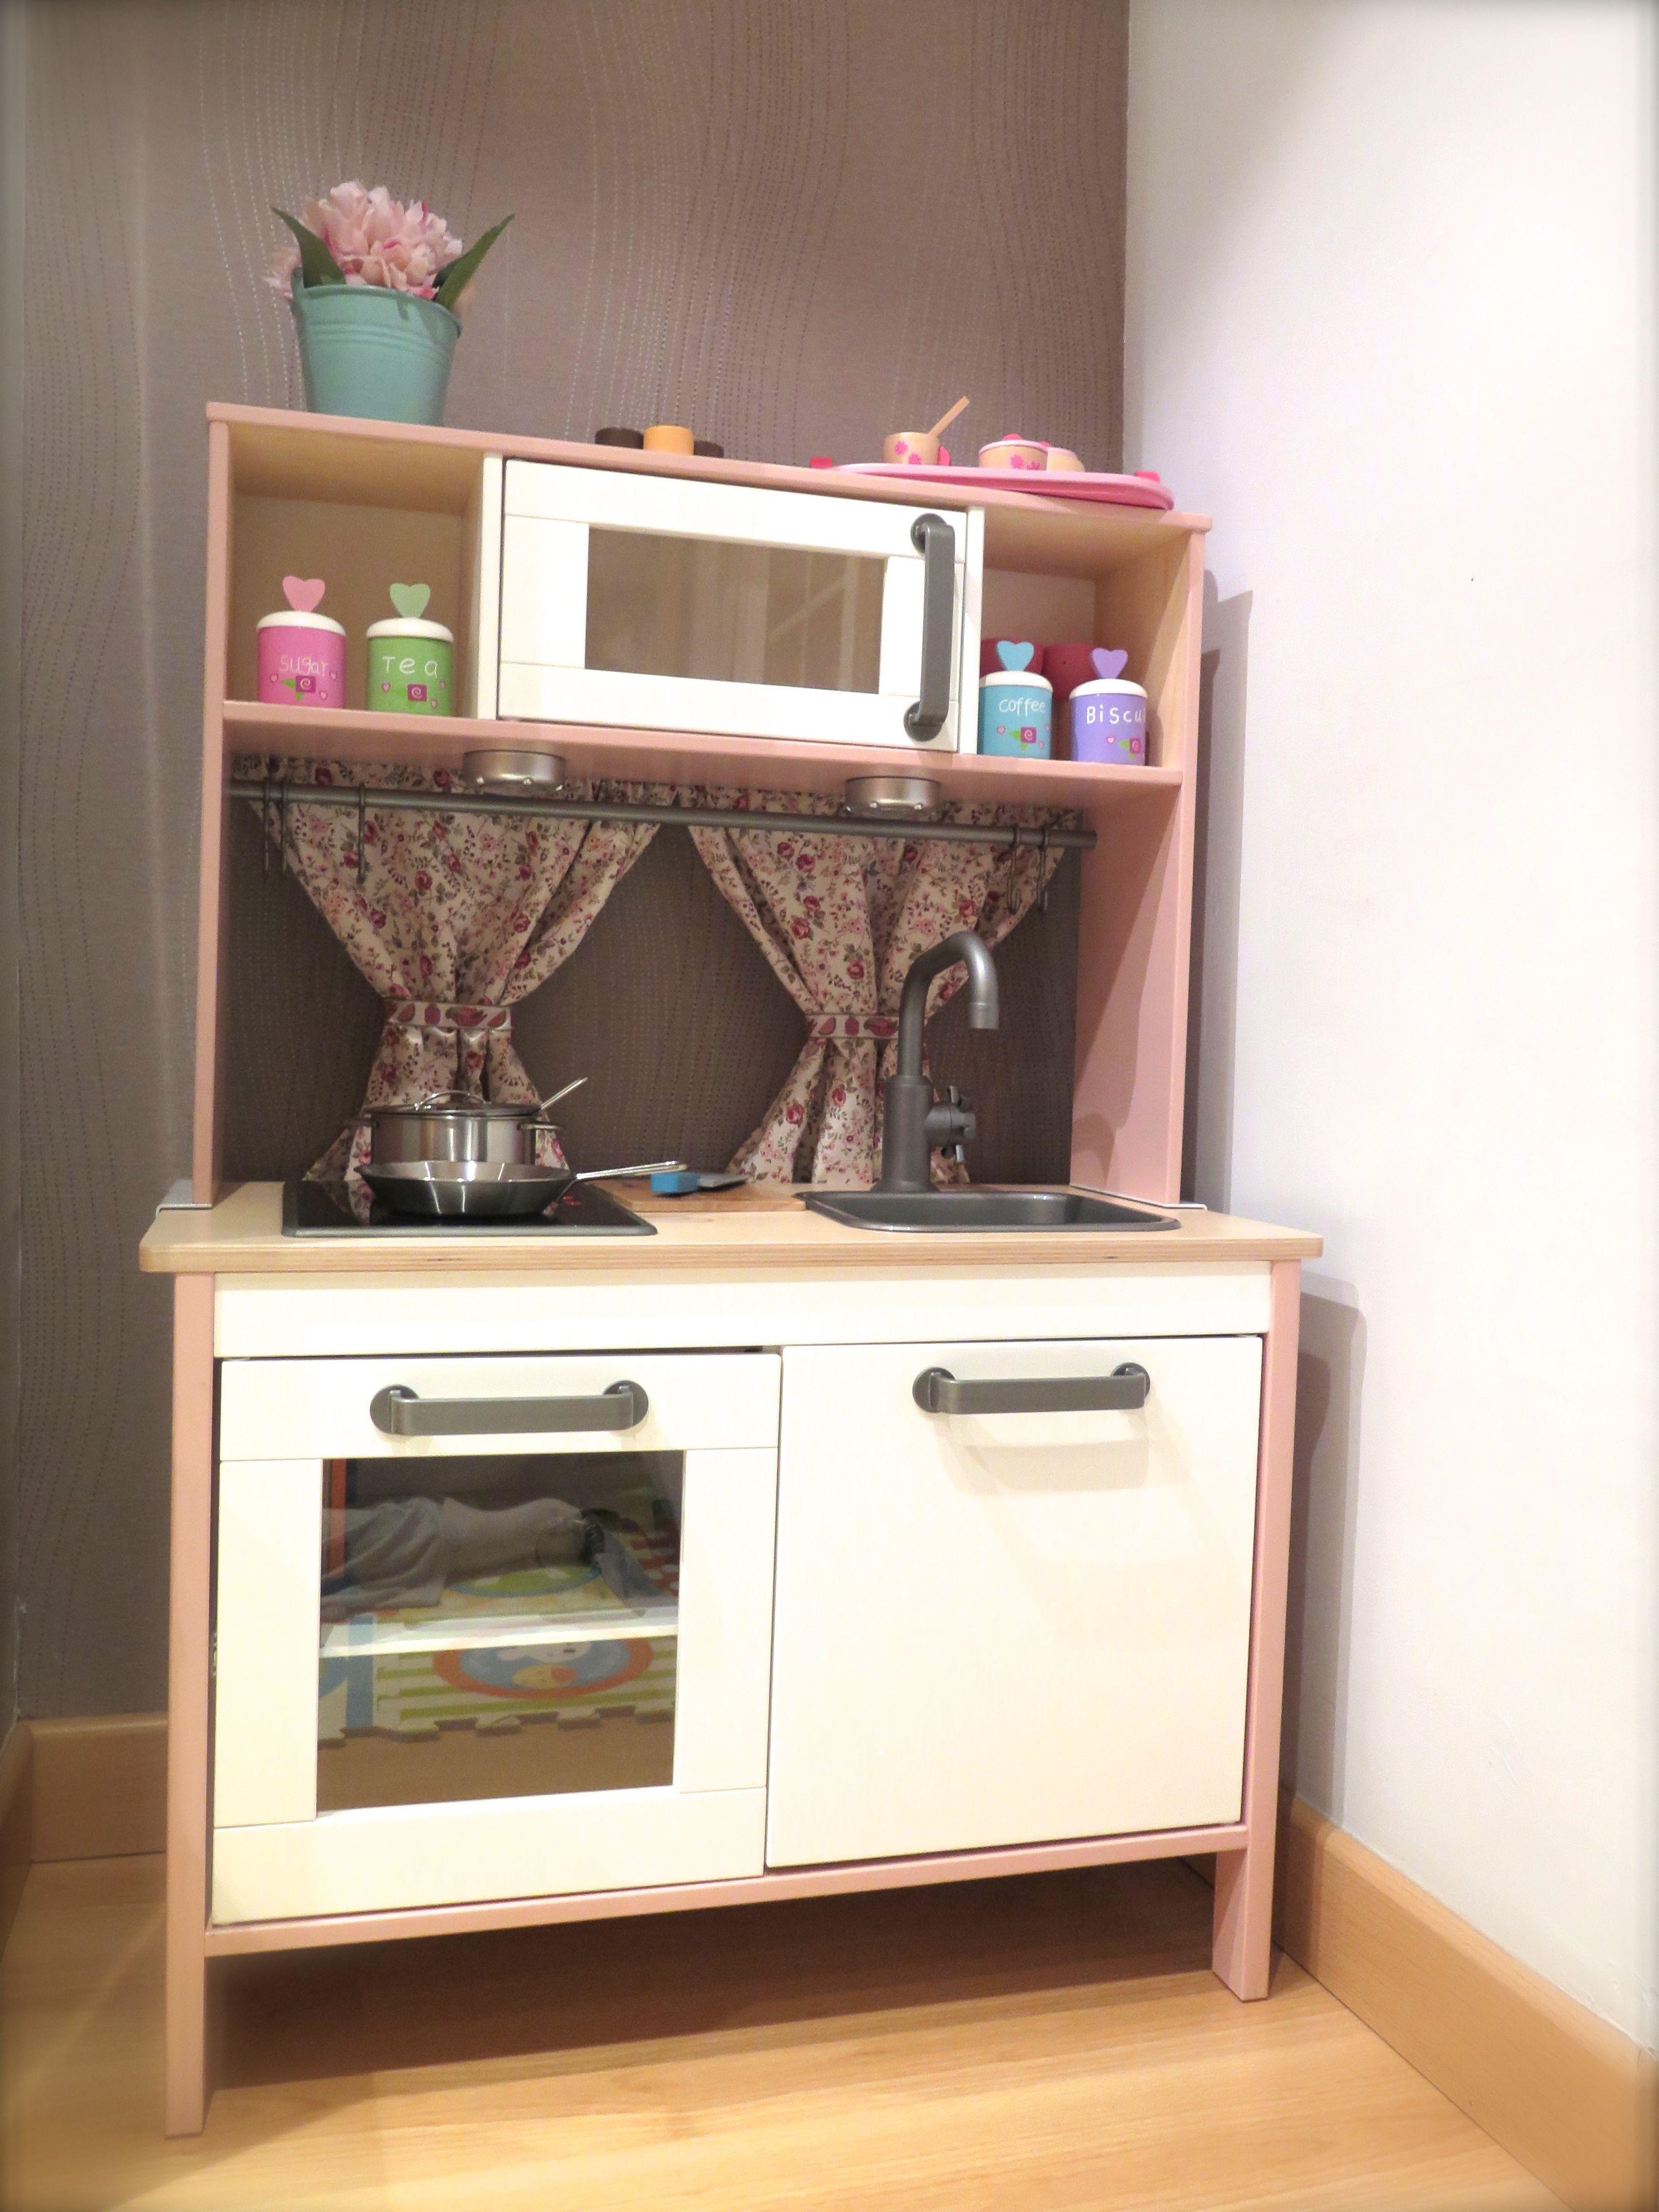 Es la cocina de juguete de ikea modelo dukting customizada for Cocina de creacion